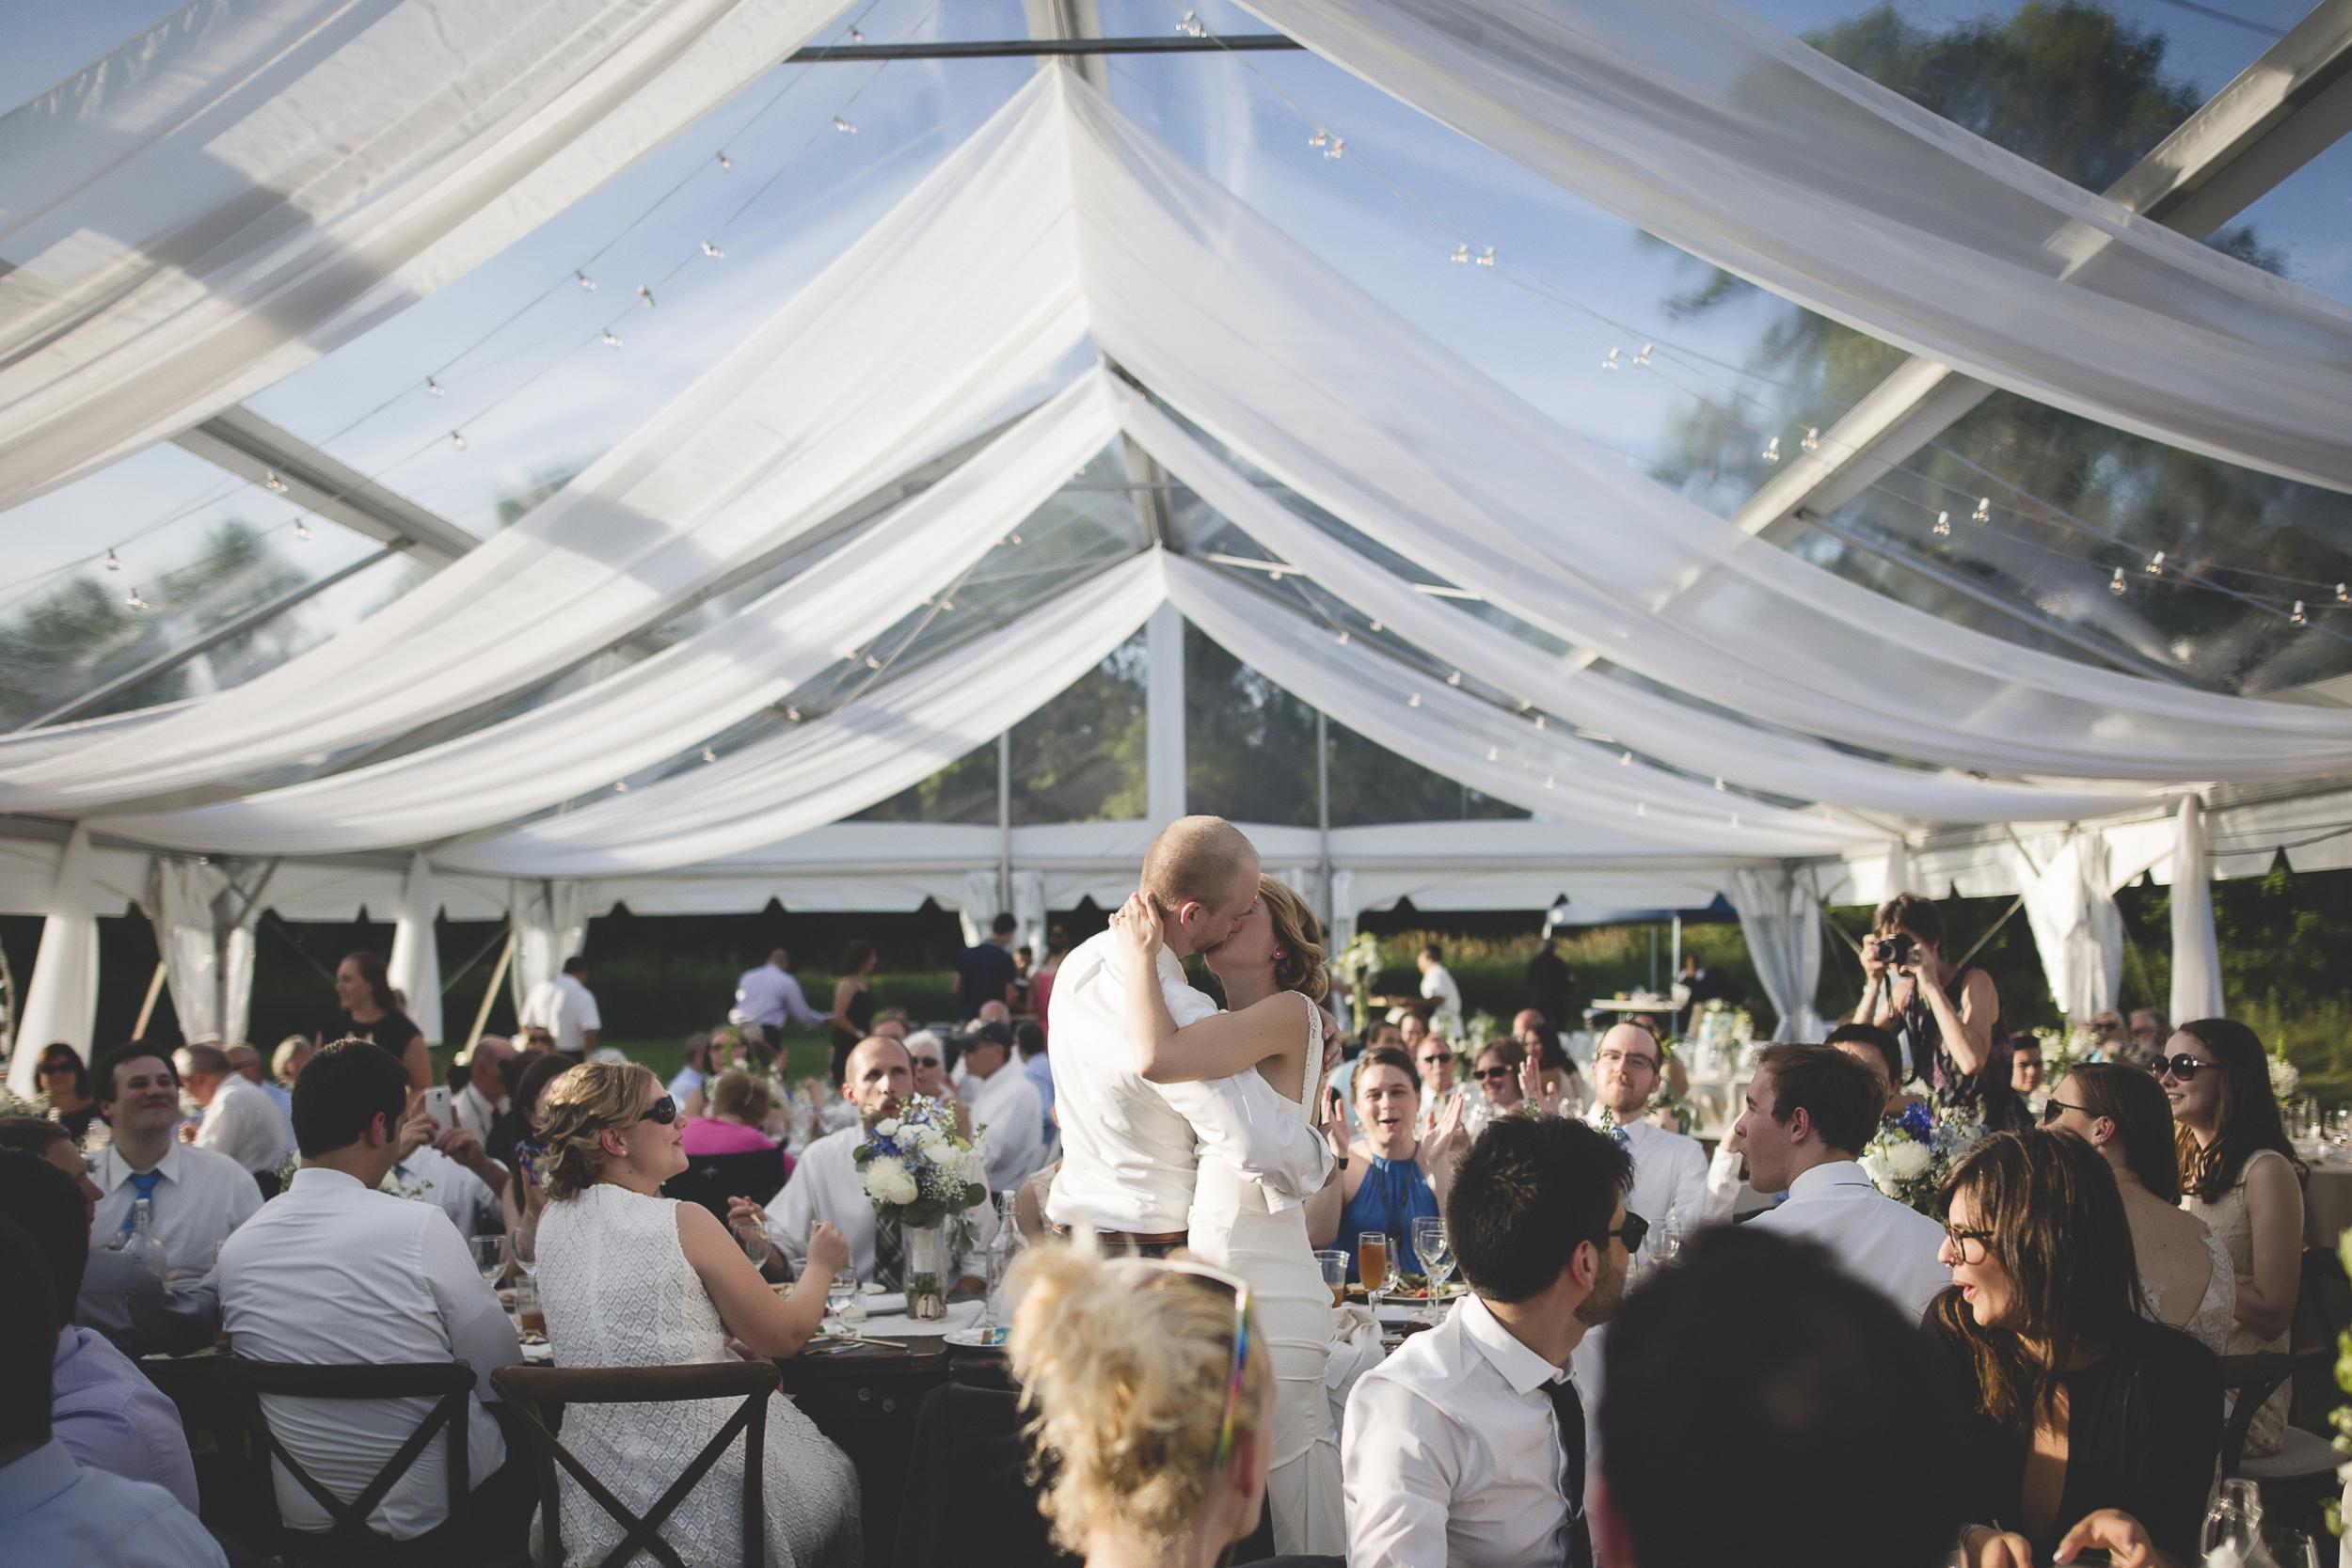 67 Minneapolis home backyard outdoor wedding tent reception 2.jpg